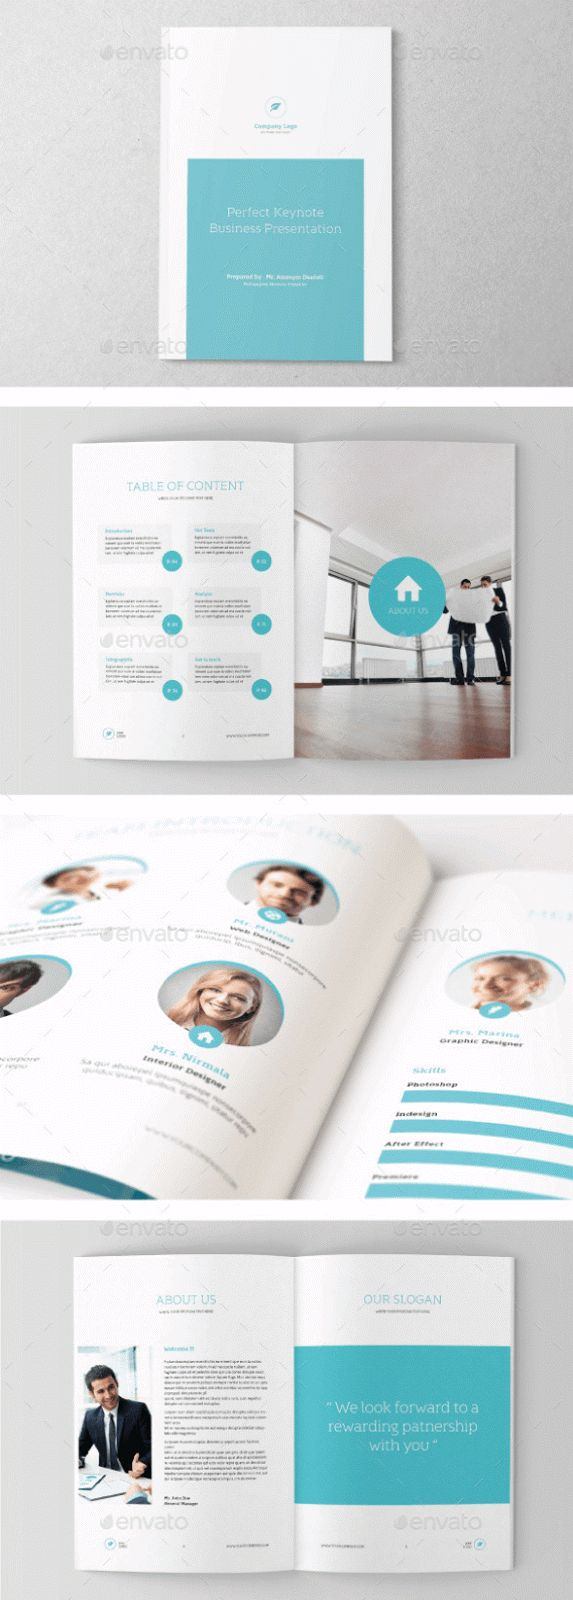 91 best Brochure Design images on Pinterest | Brochure template ...